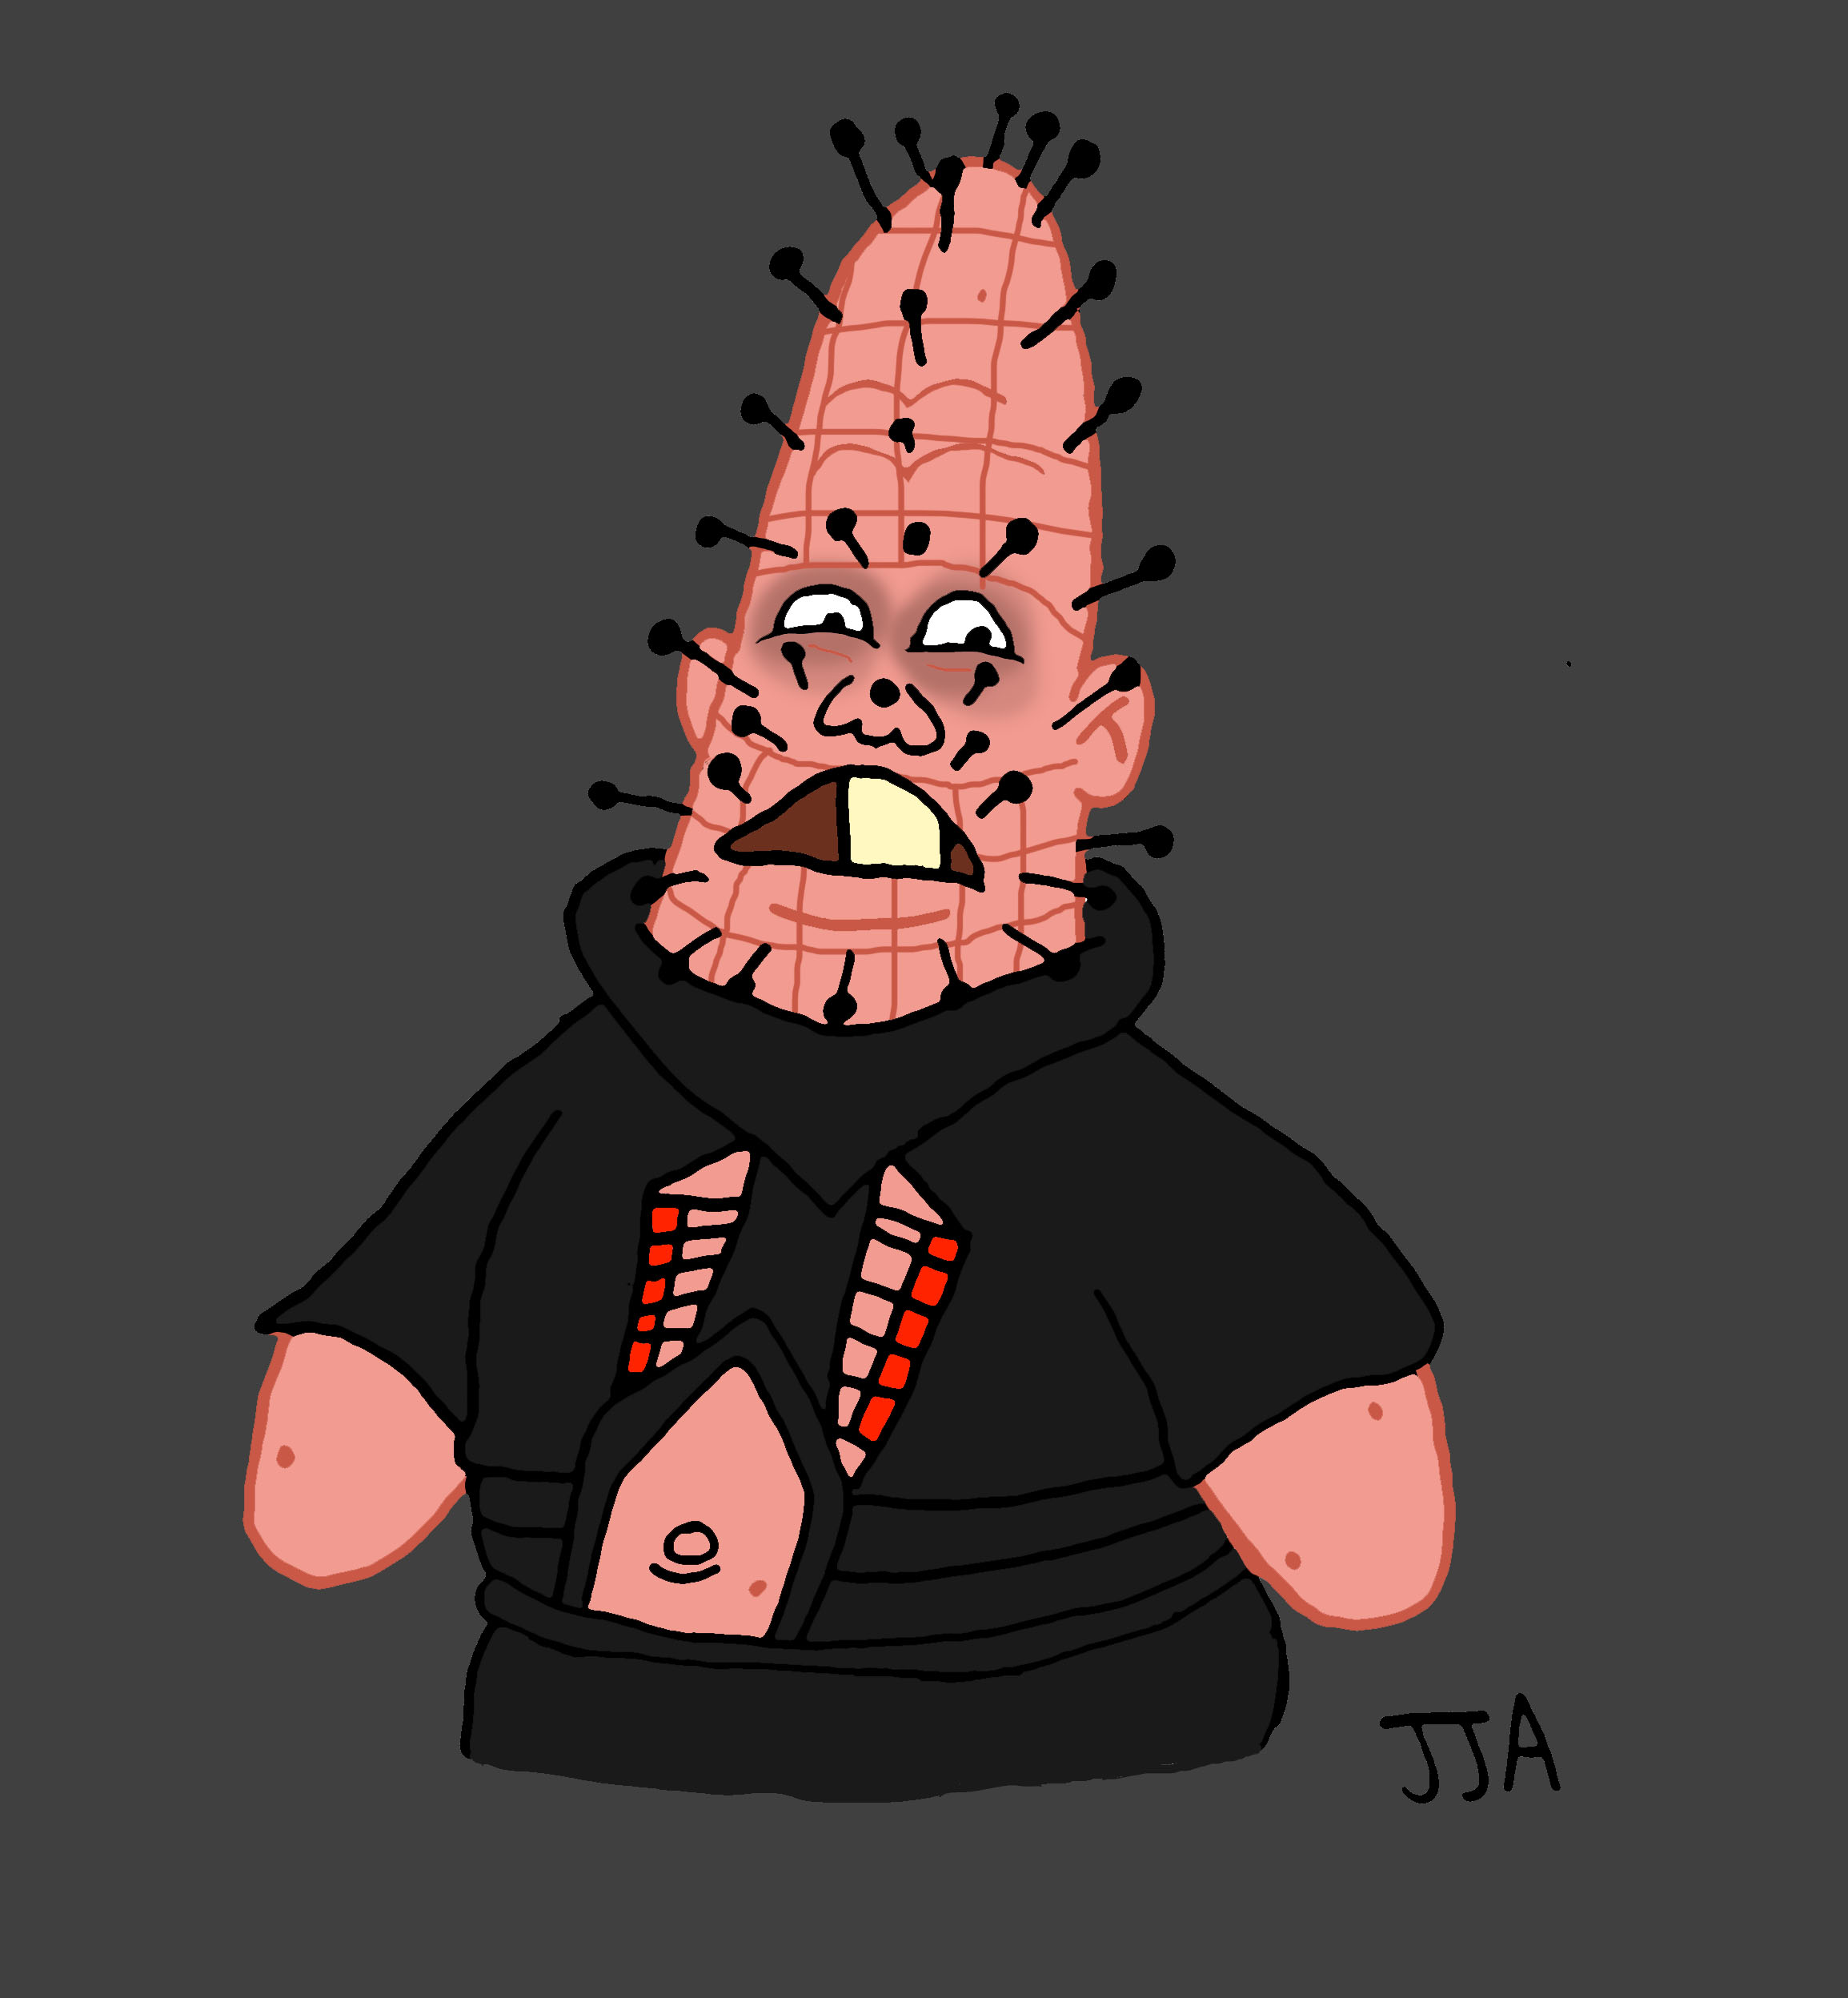 363 who you callin' pinhead? spongebob squarepants know your meme